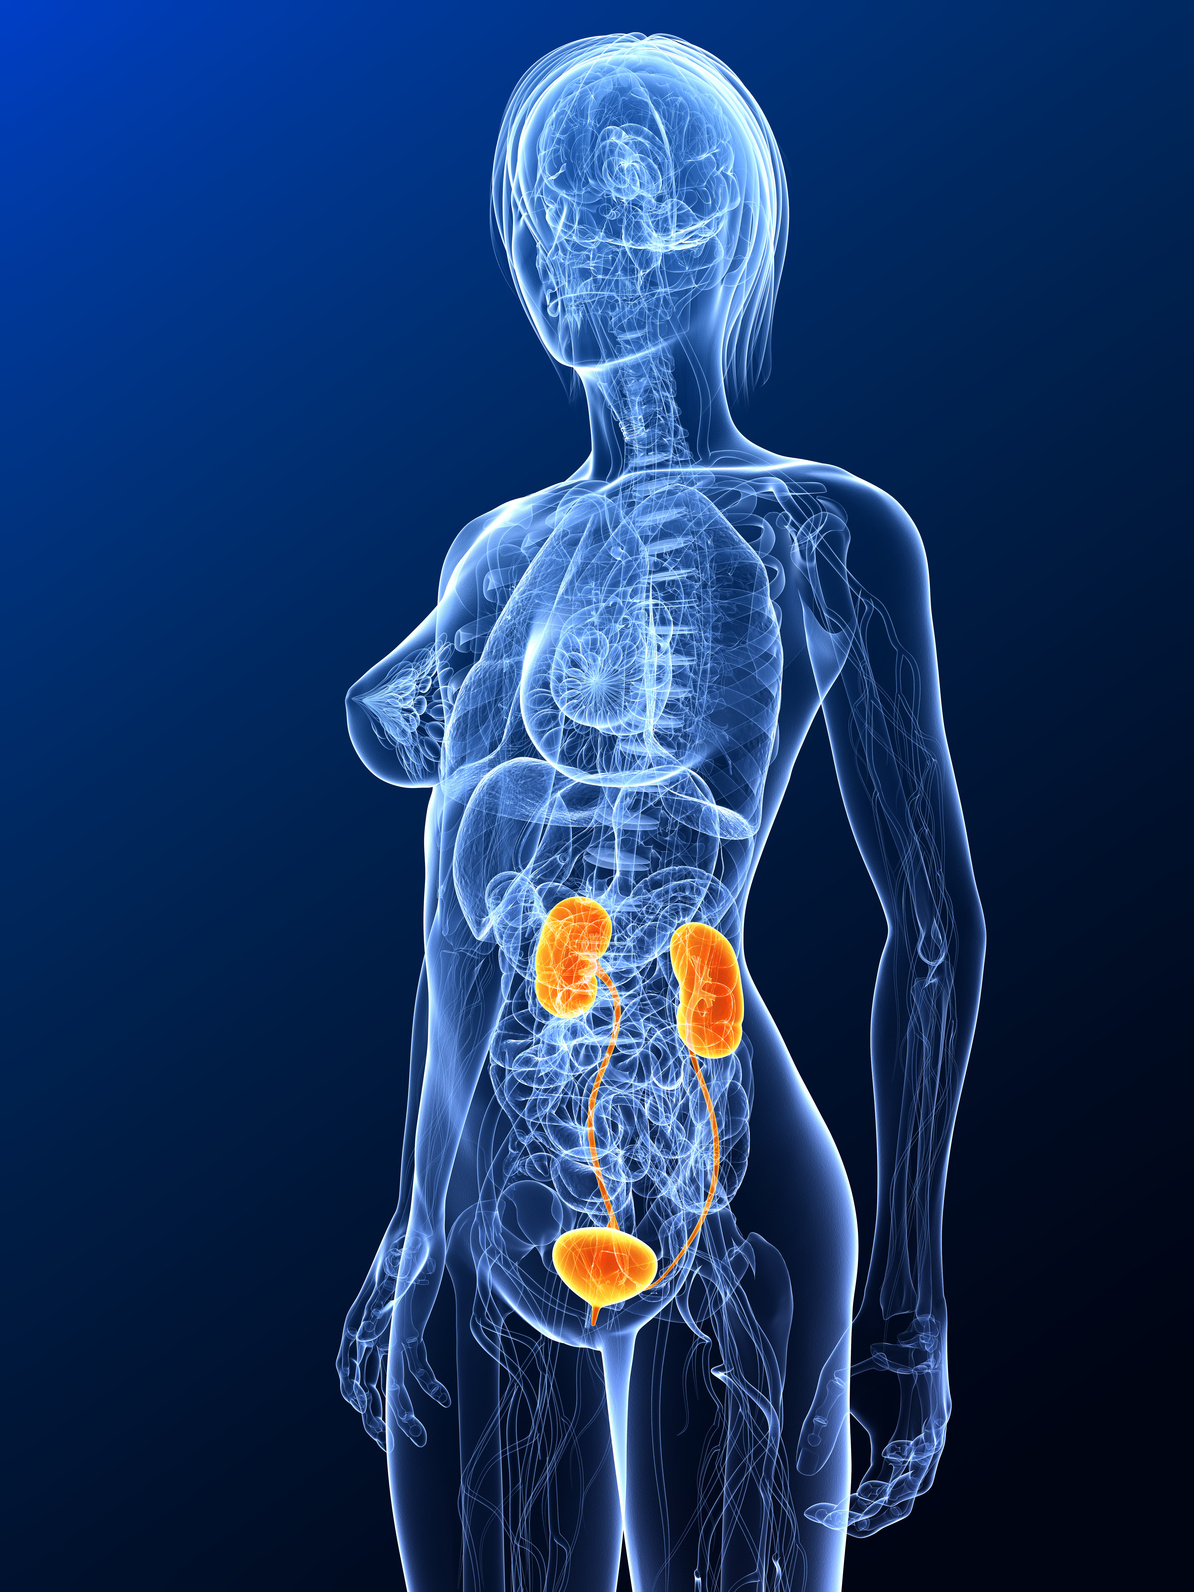 Ultraschalluntersuchung in der Urologie - Anwendungsgebiete ...